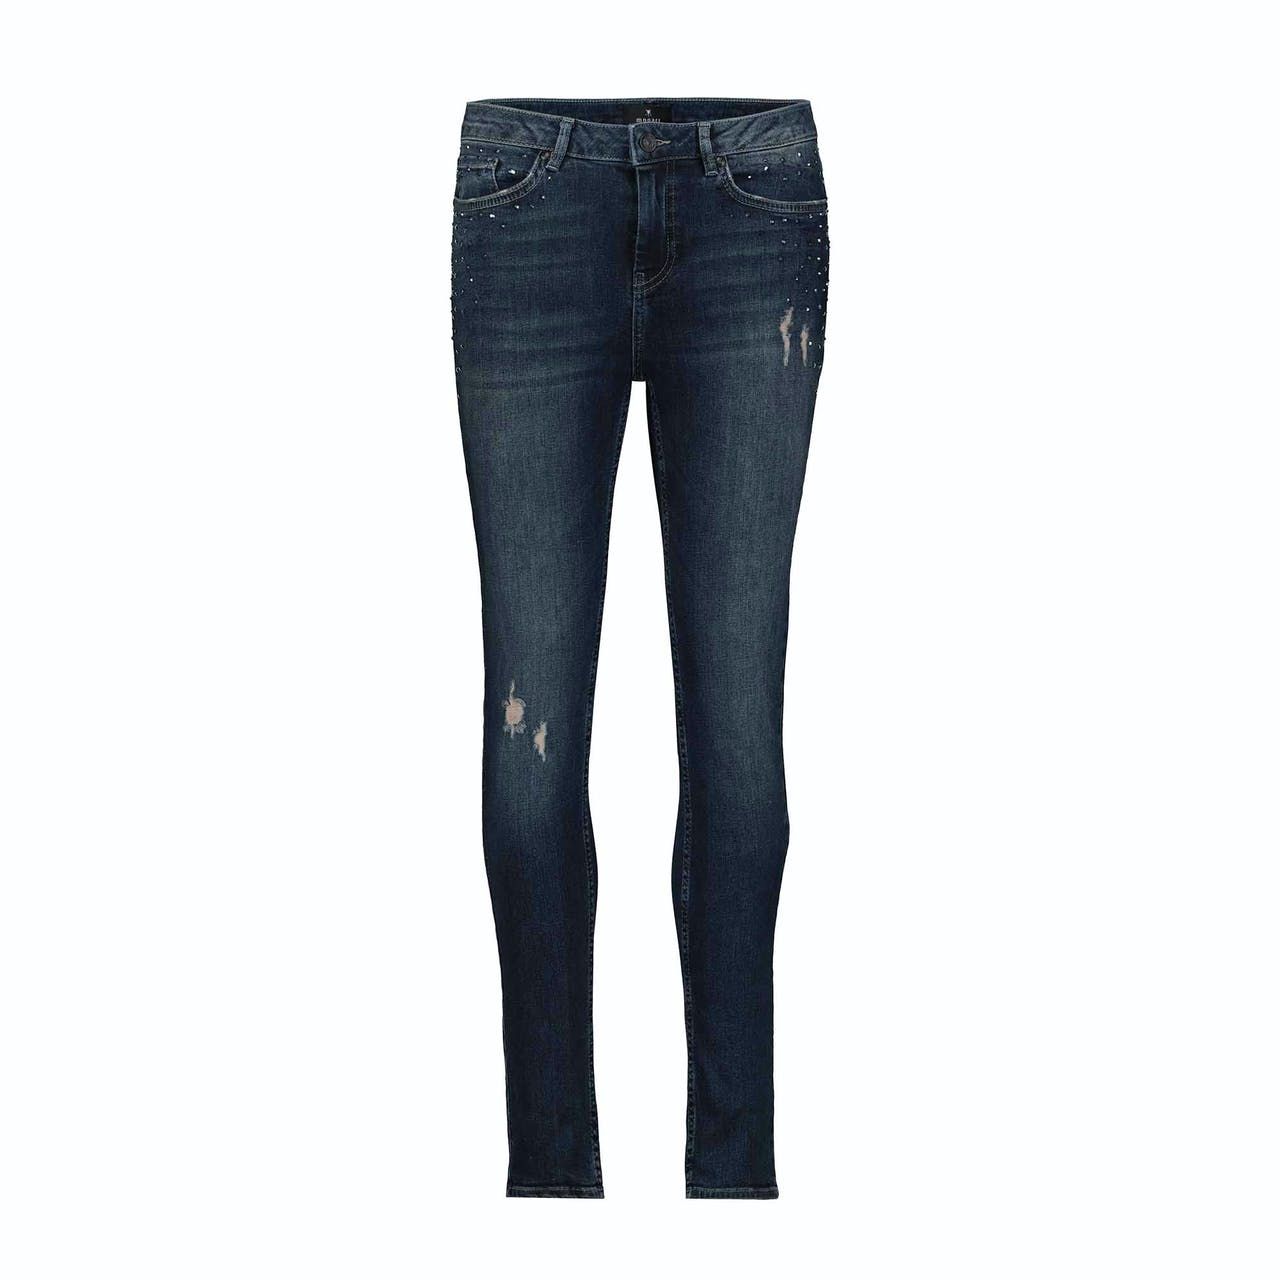 Jeans - Skinny Fit - Used-Look